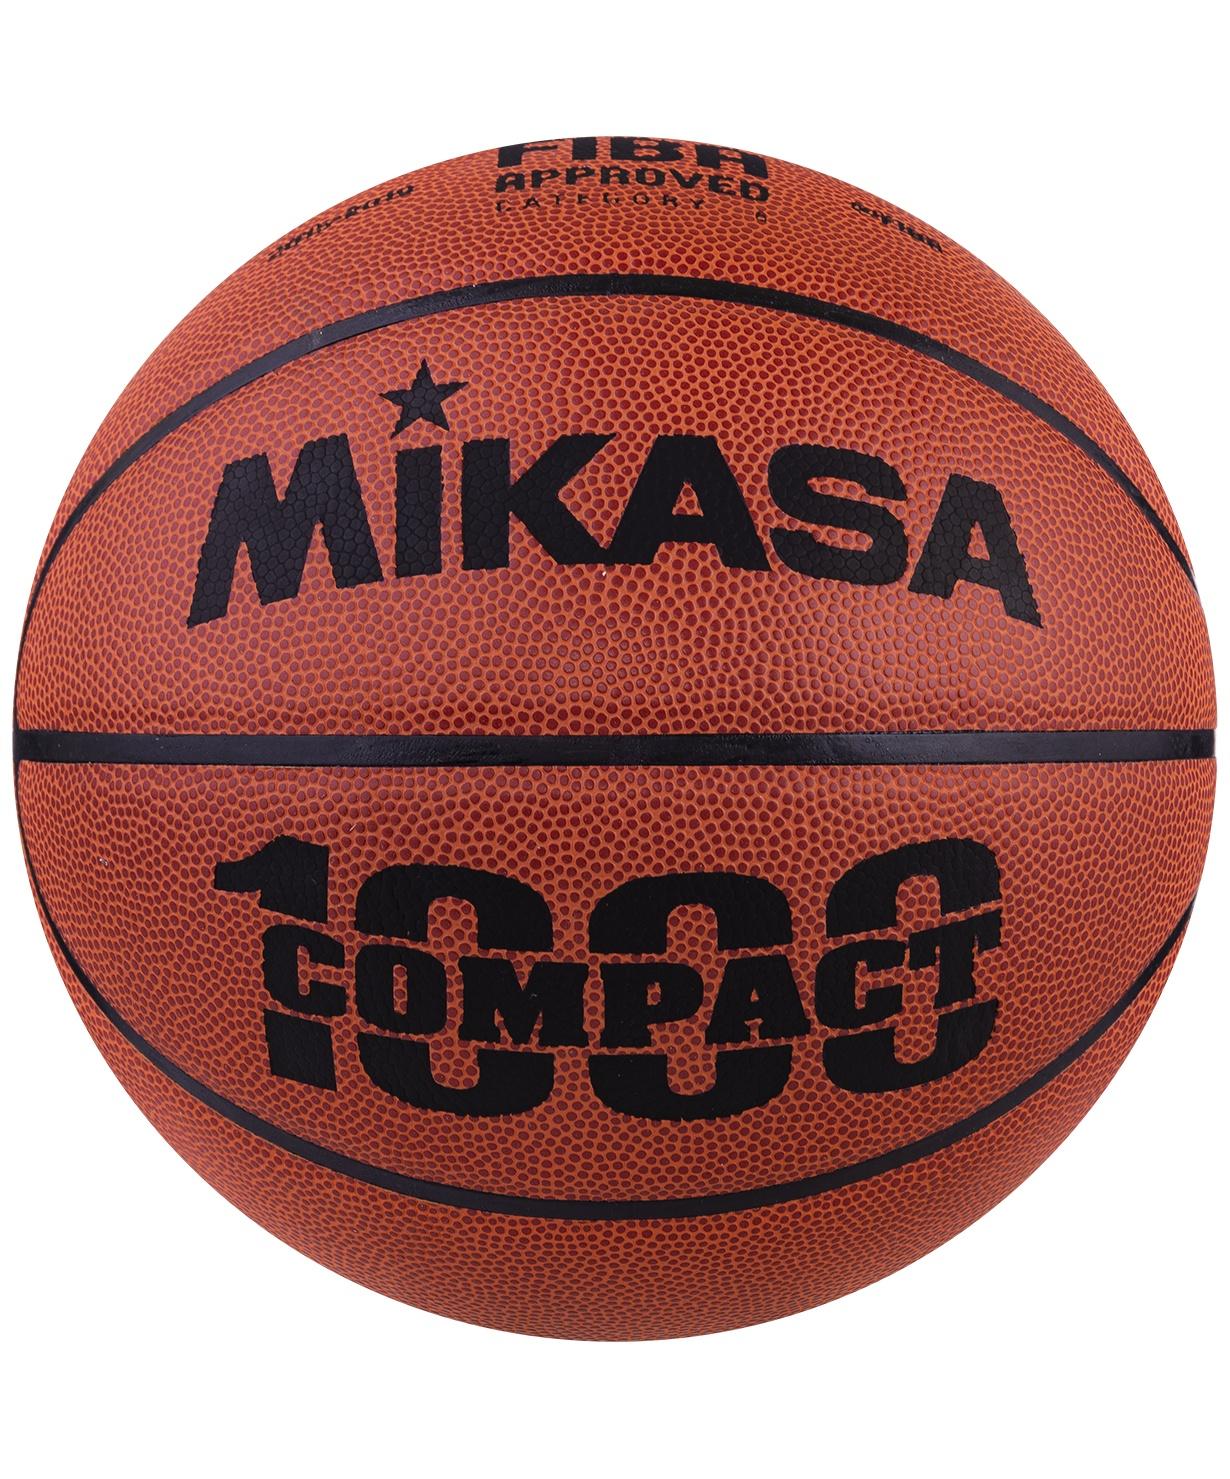 Мяч баскетбольный Mikasa BQC 1000, Размер 6 мяч баскетбольный mikasa 1020 р 7 8 панелей